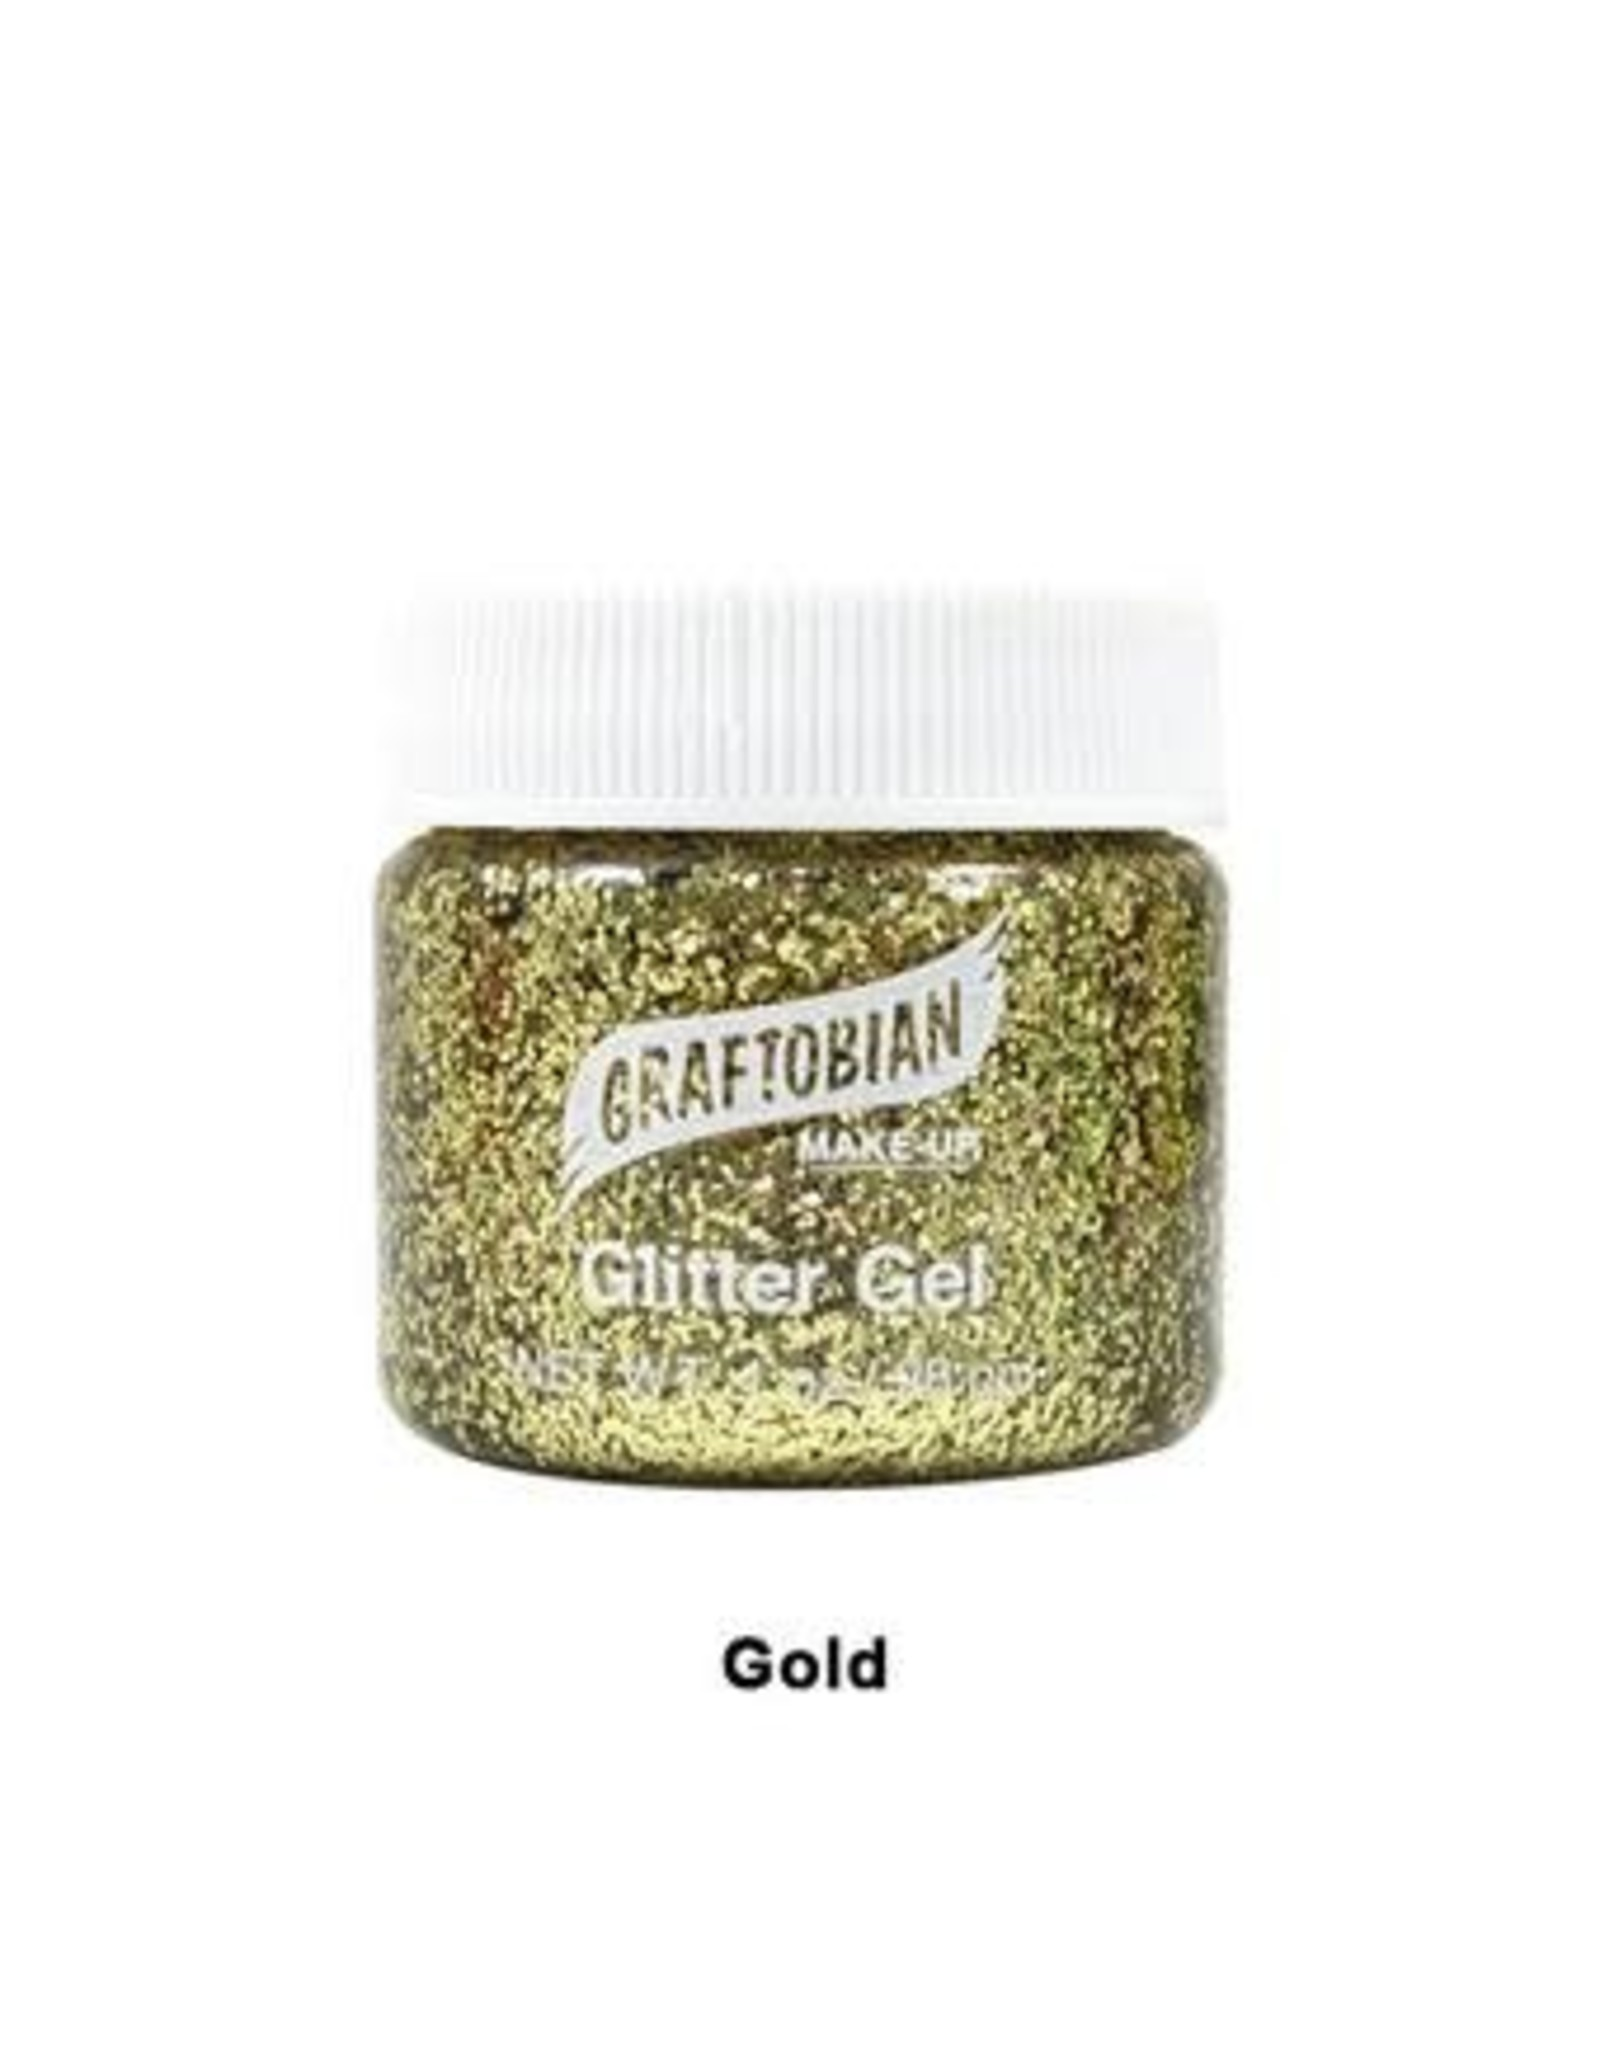 Graftobian Graftobian Glitter Gel